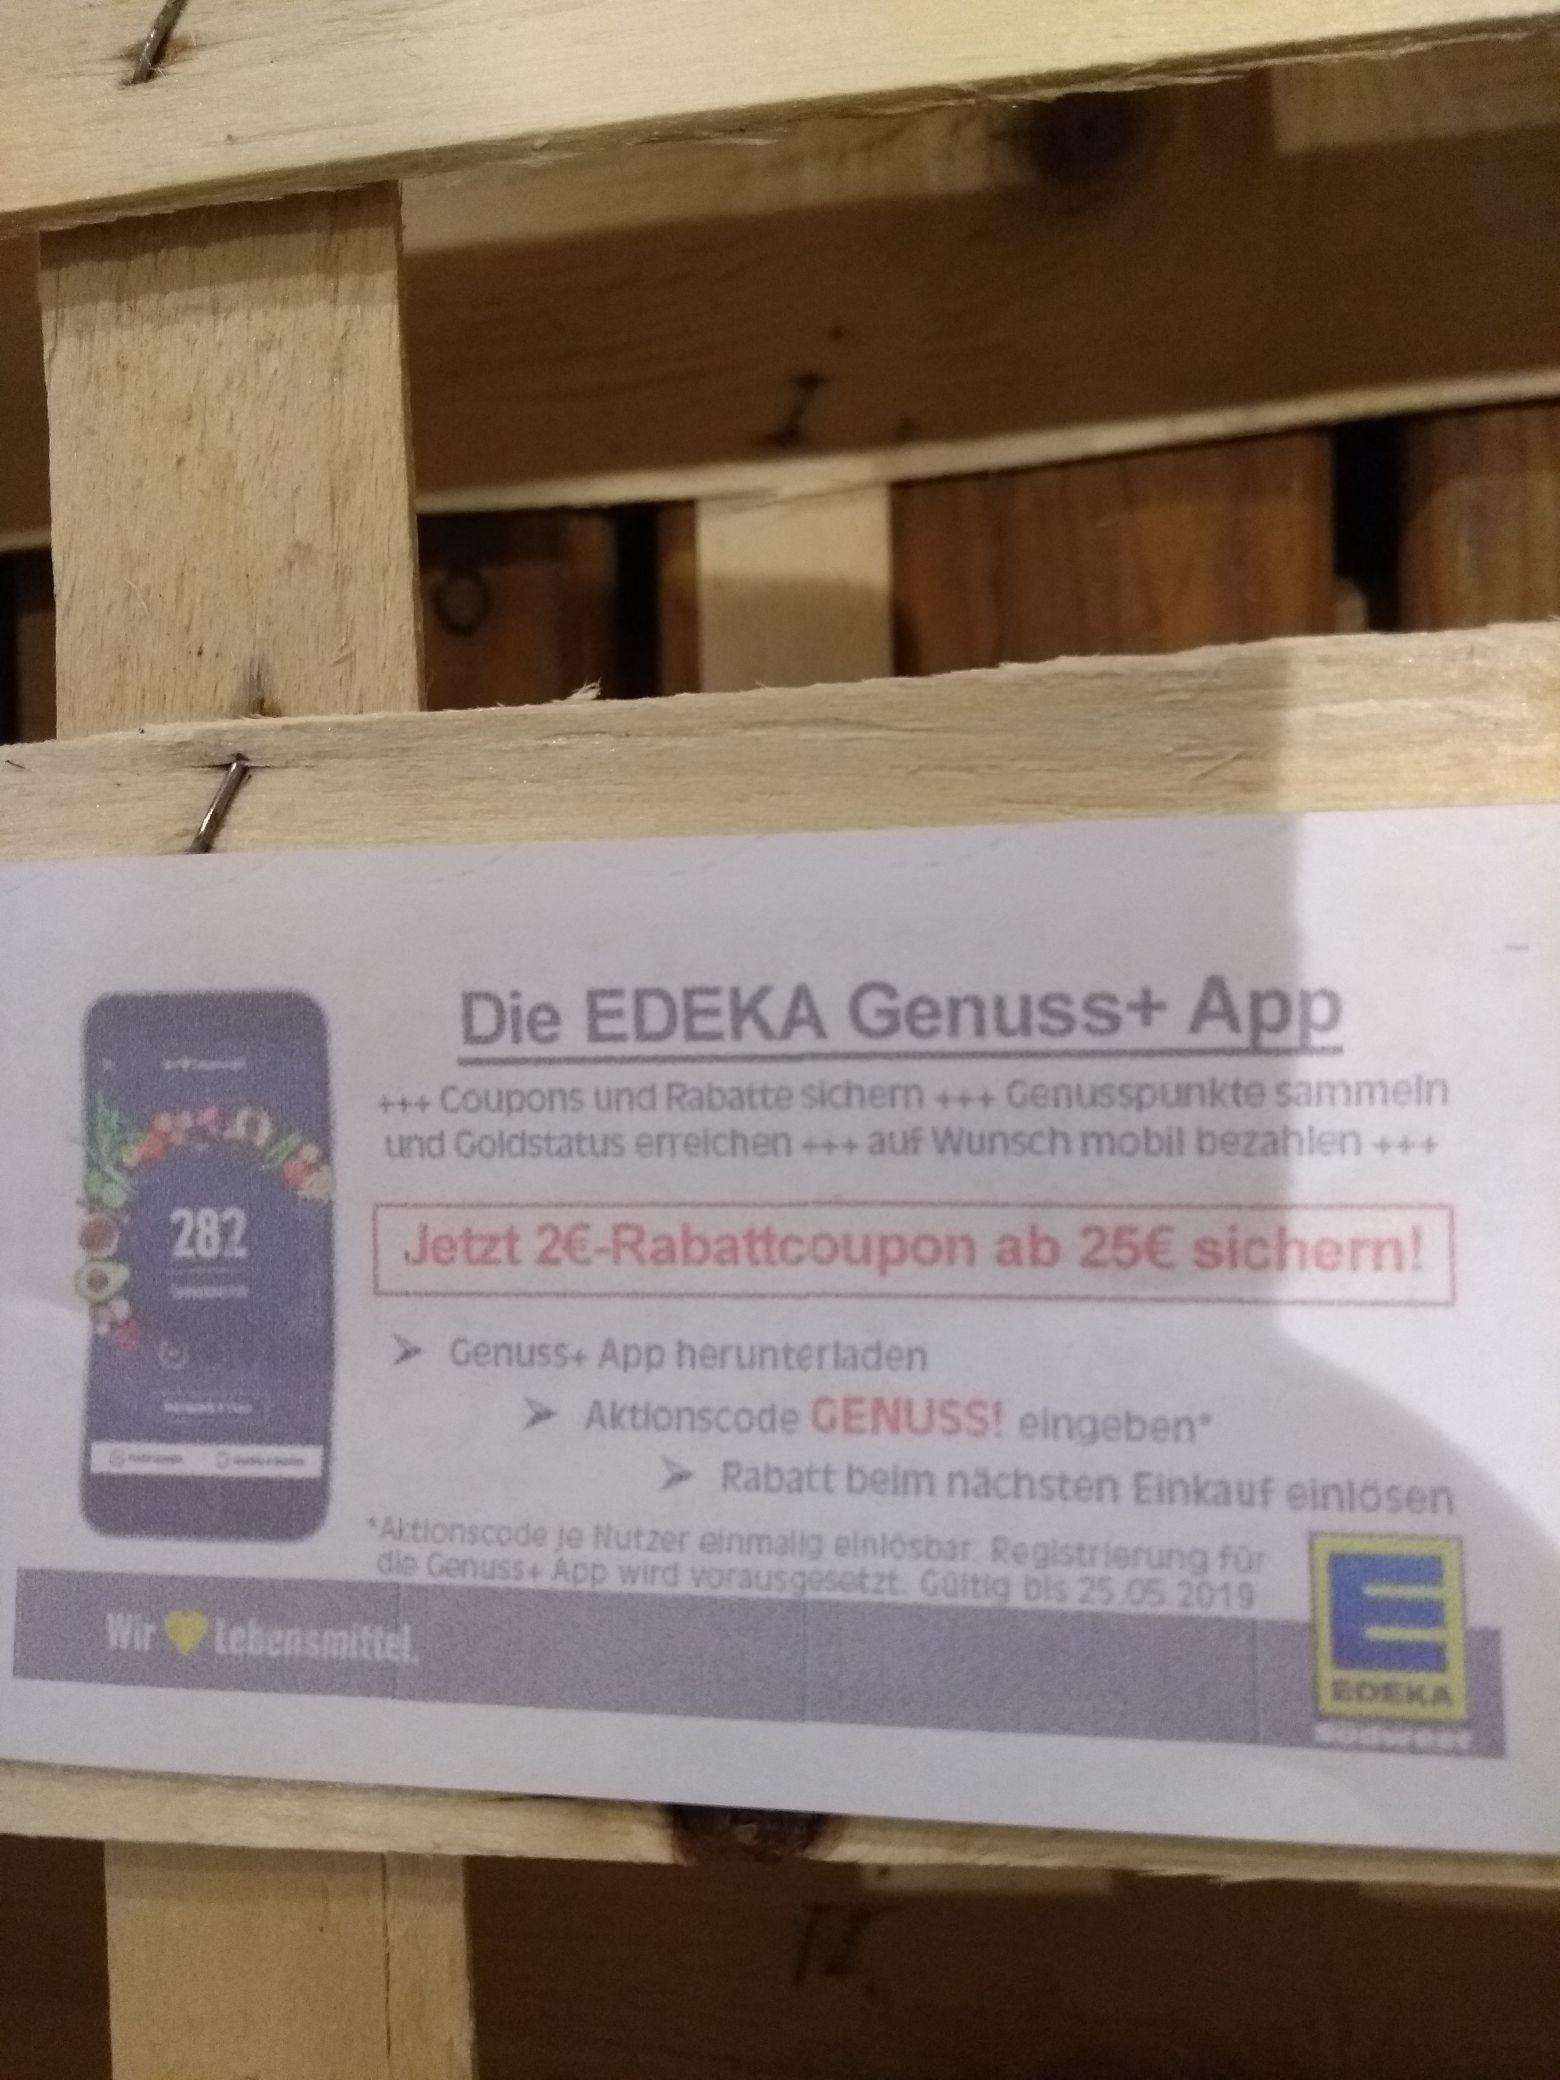 Edeka App 2Euro Rabatt ab 25Euro  Einkauf.Evtl lokal